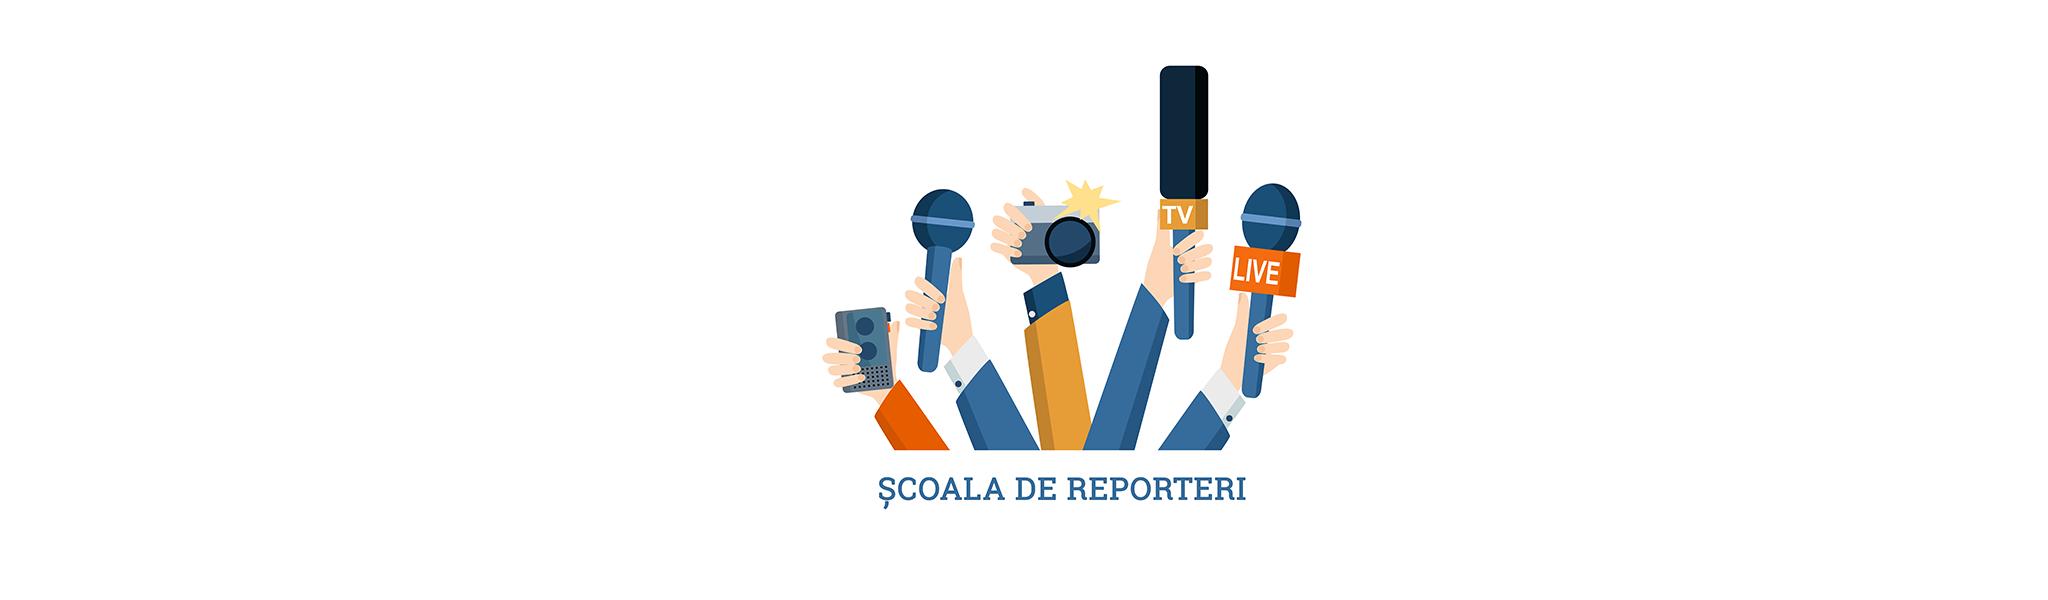 Școala de reporteri